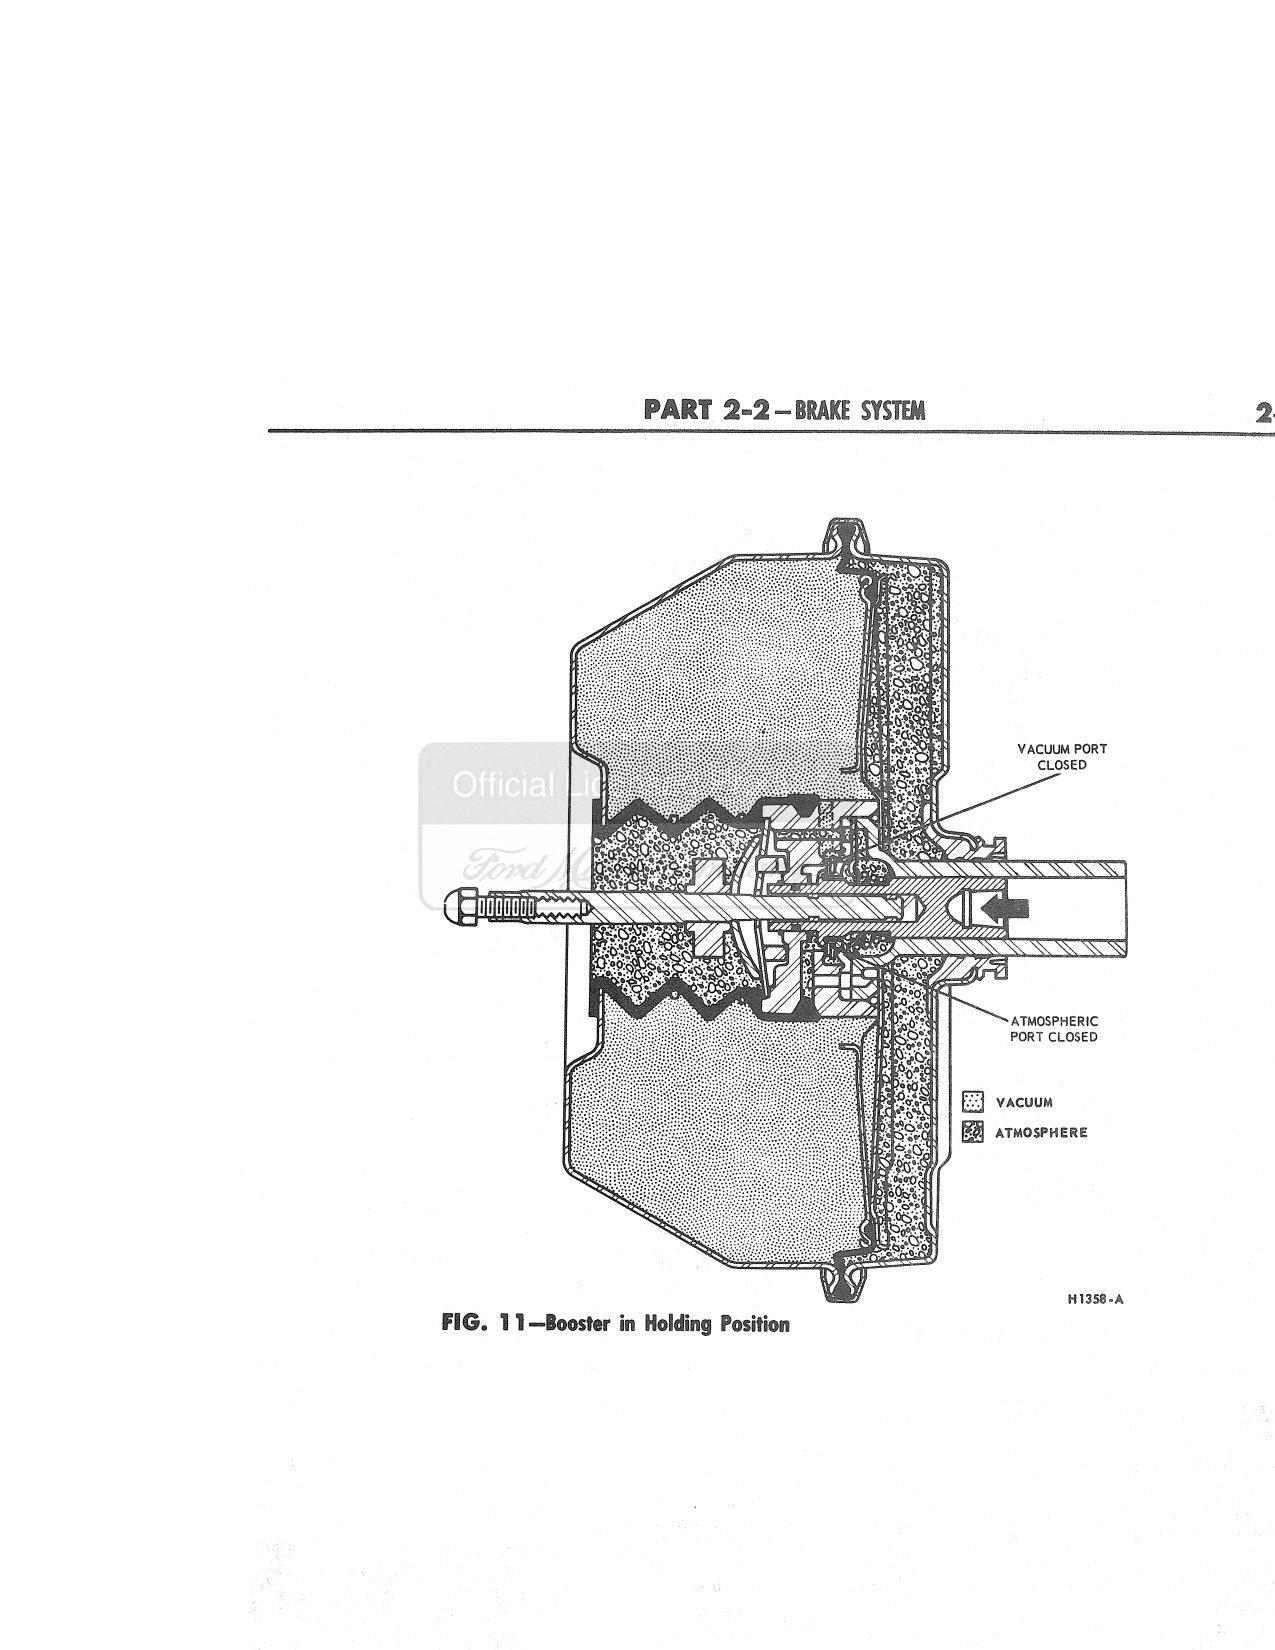 1965 Comet, Falcon, Fairlane and Mustang: Shop Manual: Amazon.es: Ford Motor Co: Libros